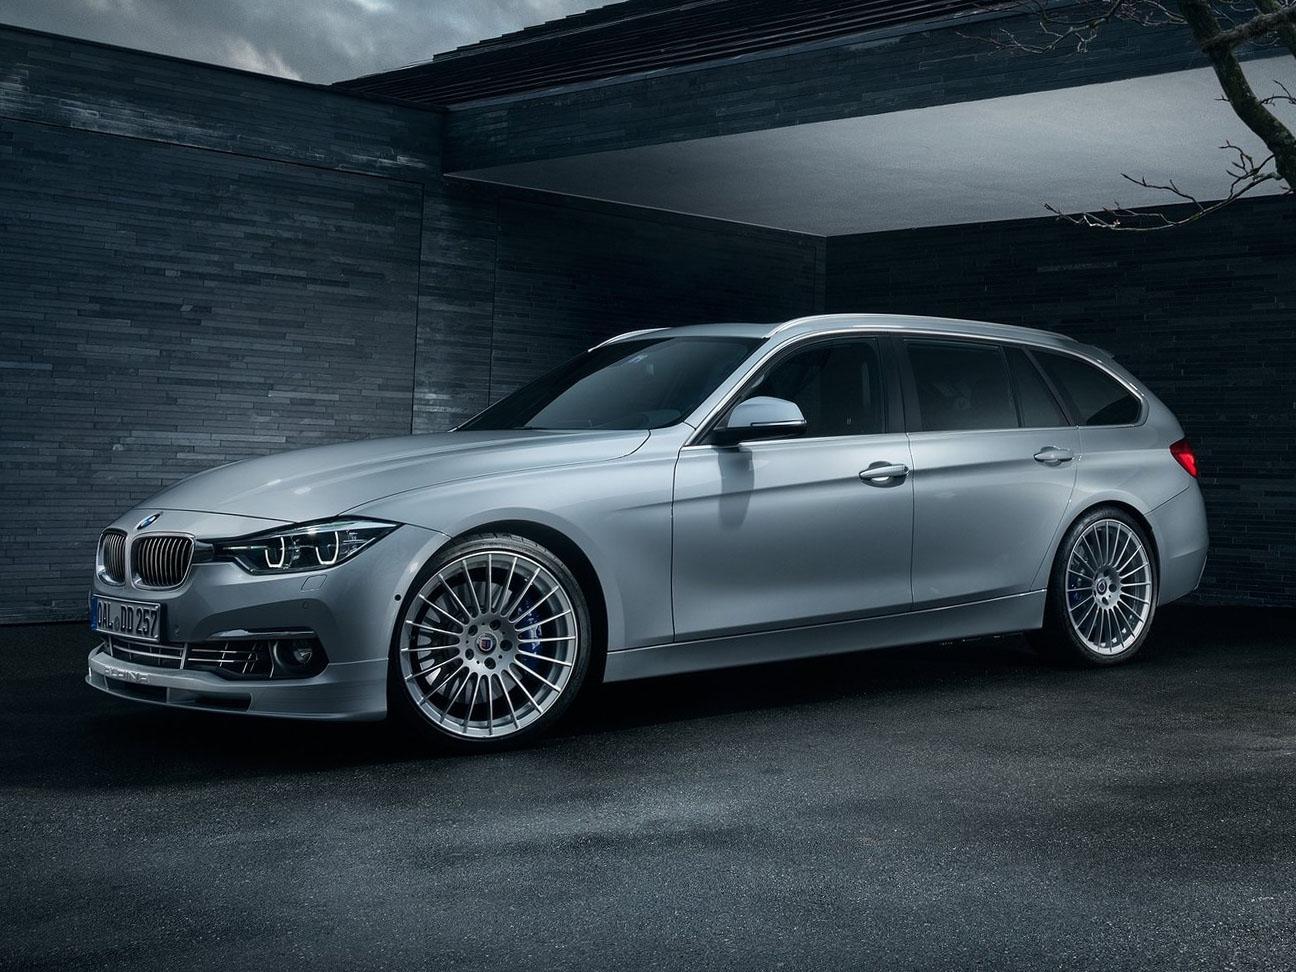 BMW ALPINA D3 BITURBO Touring - recenze a ceny